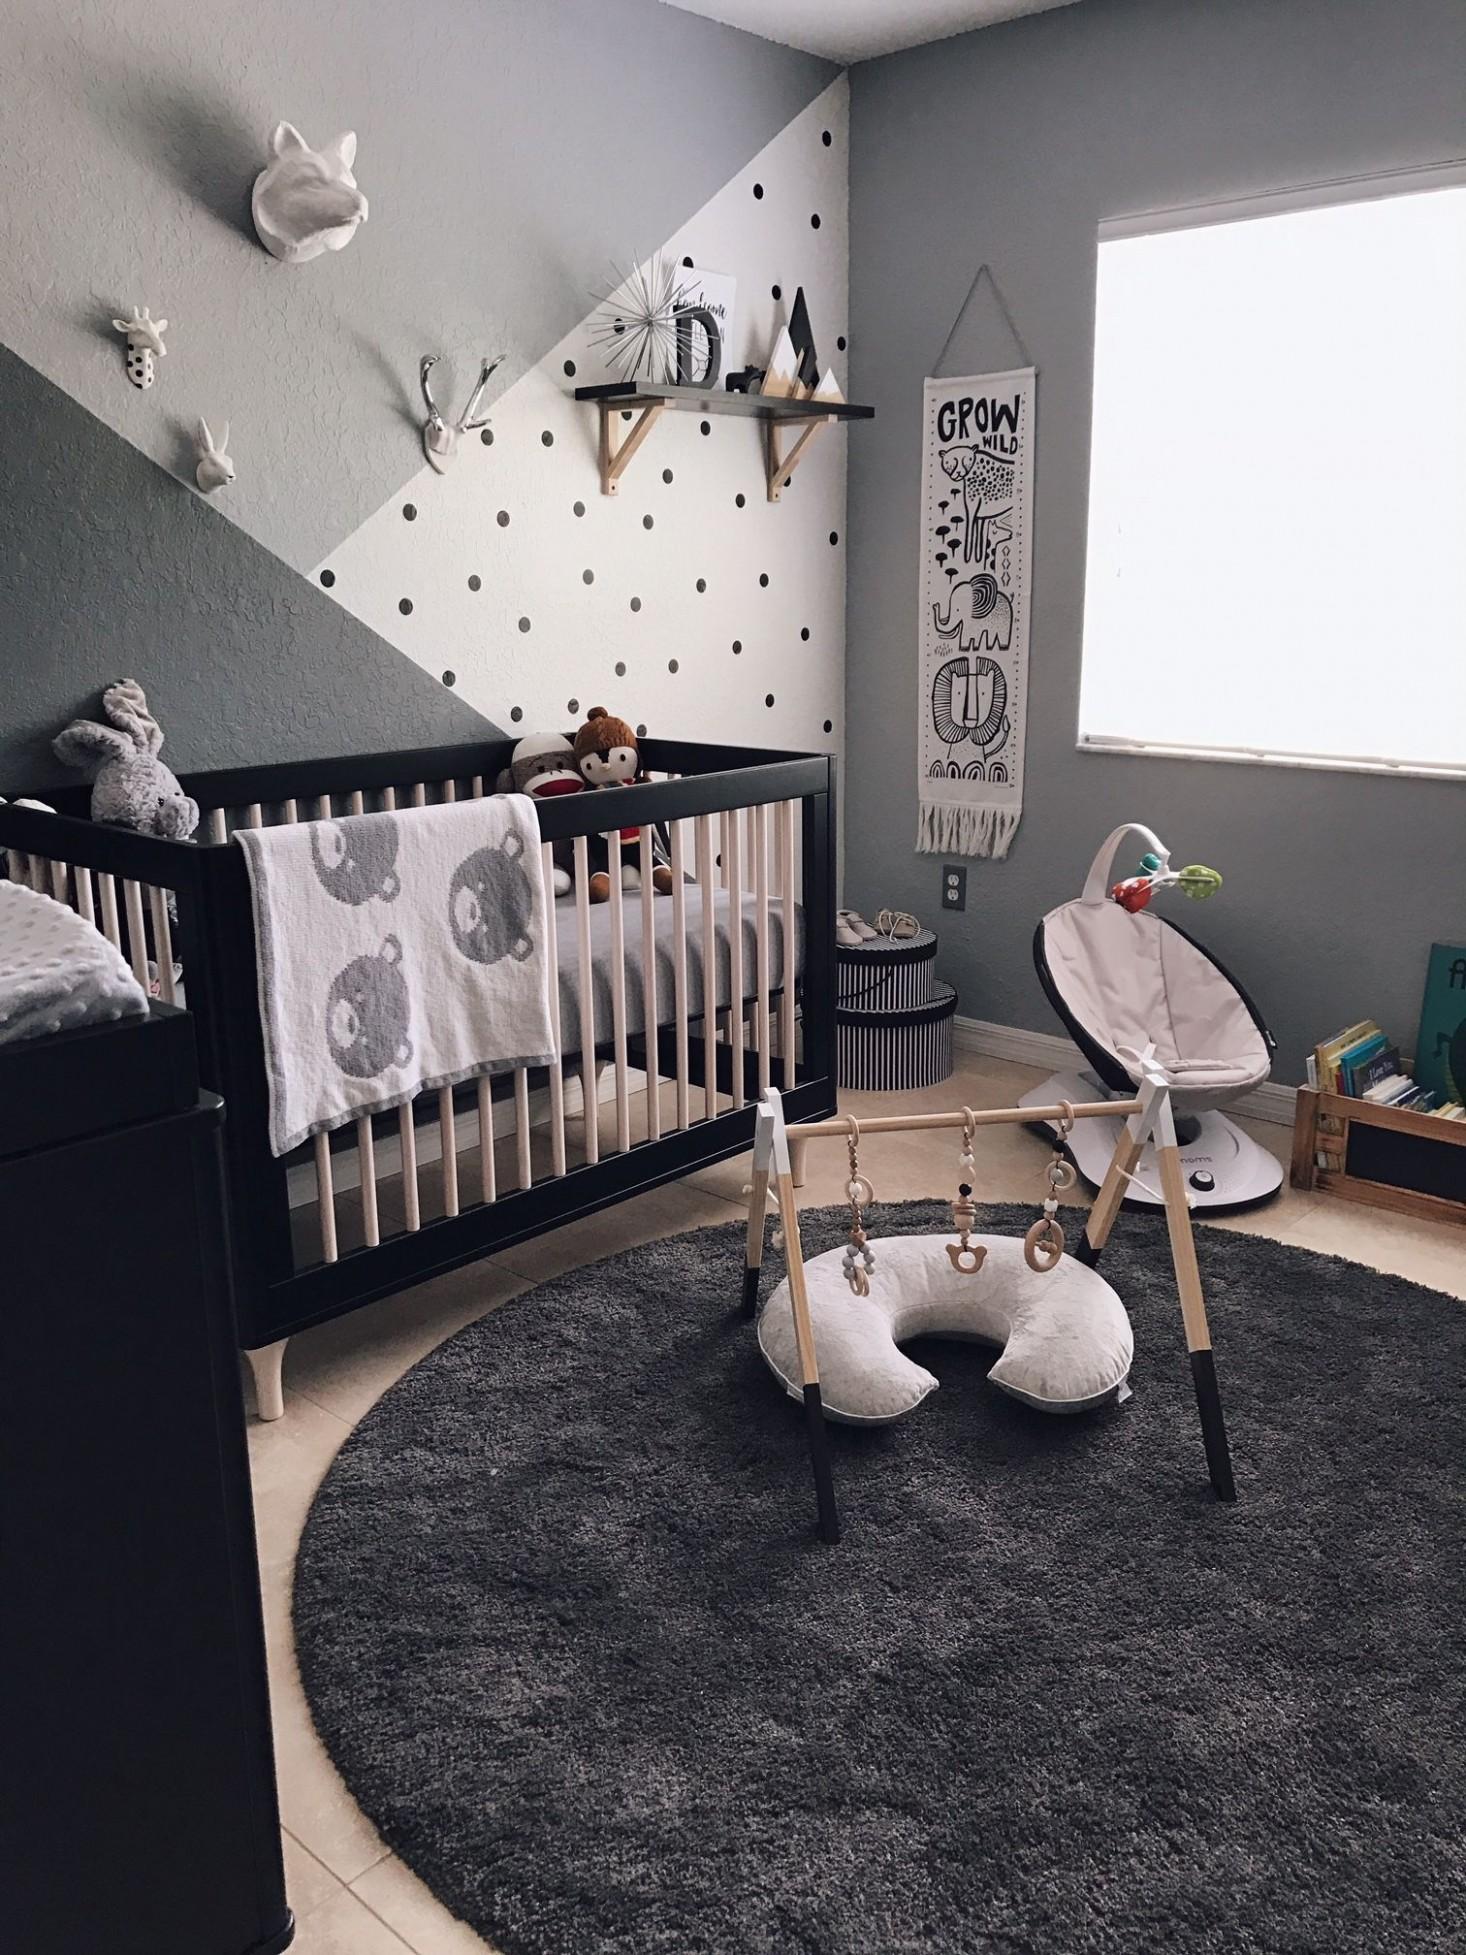 10 Creative Baby Room Themes - decoratop  Nursery baby room, Baby  - Baby Room Themes